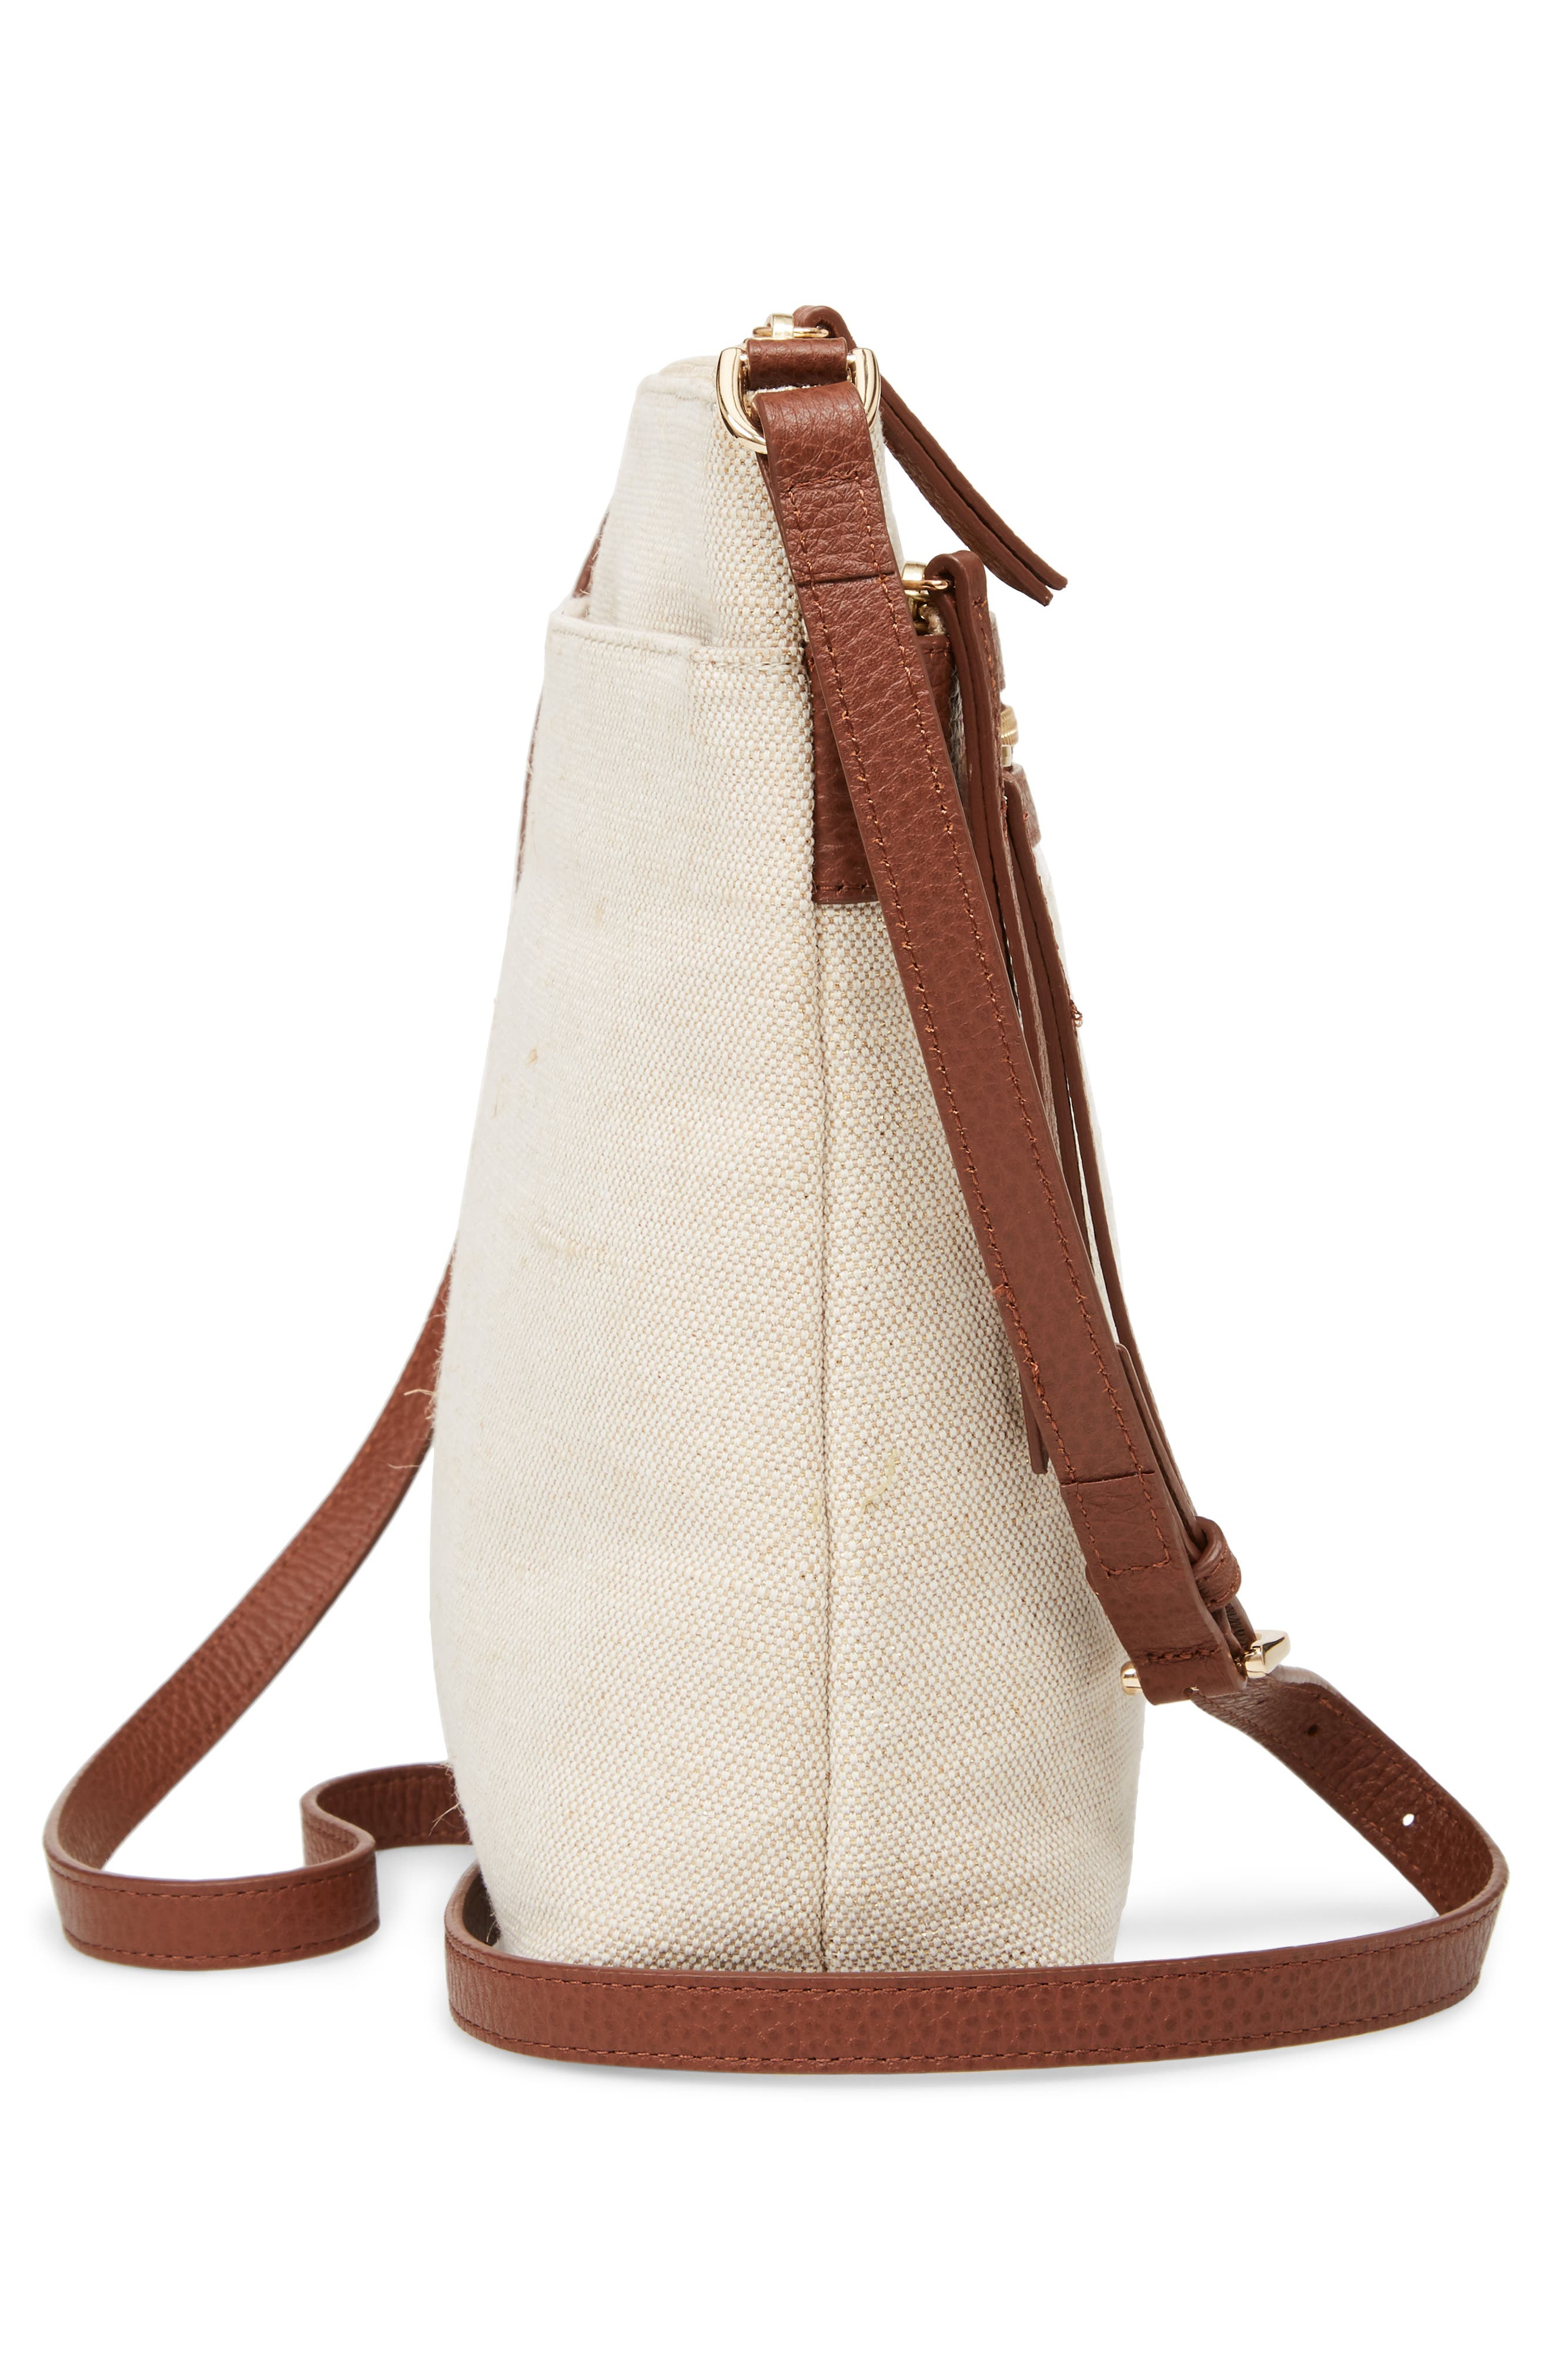 Kaison Linen & Leather Crossbody Bag,                             Alternate thumbnail 5, color,                             NATURAL/ GOLD